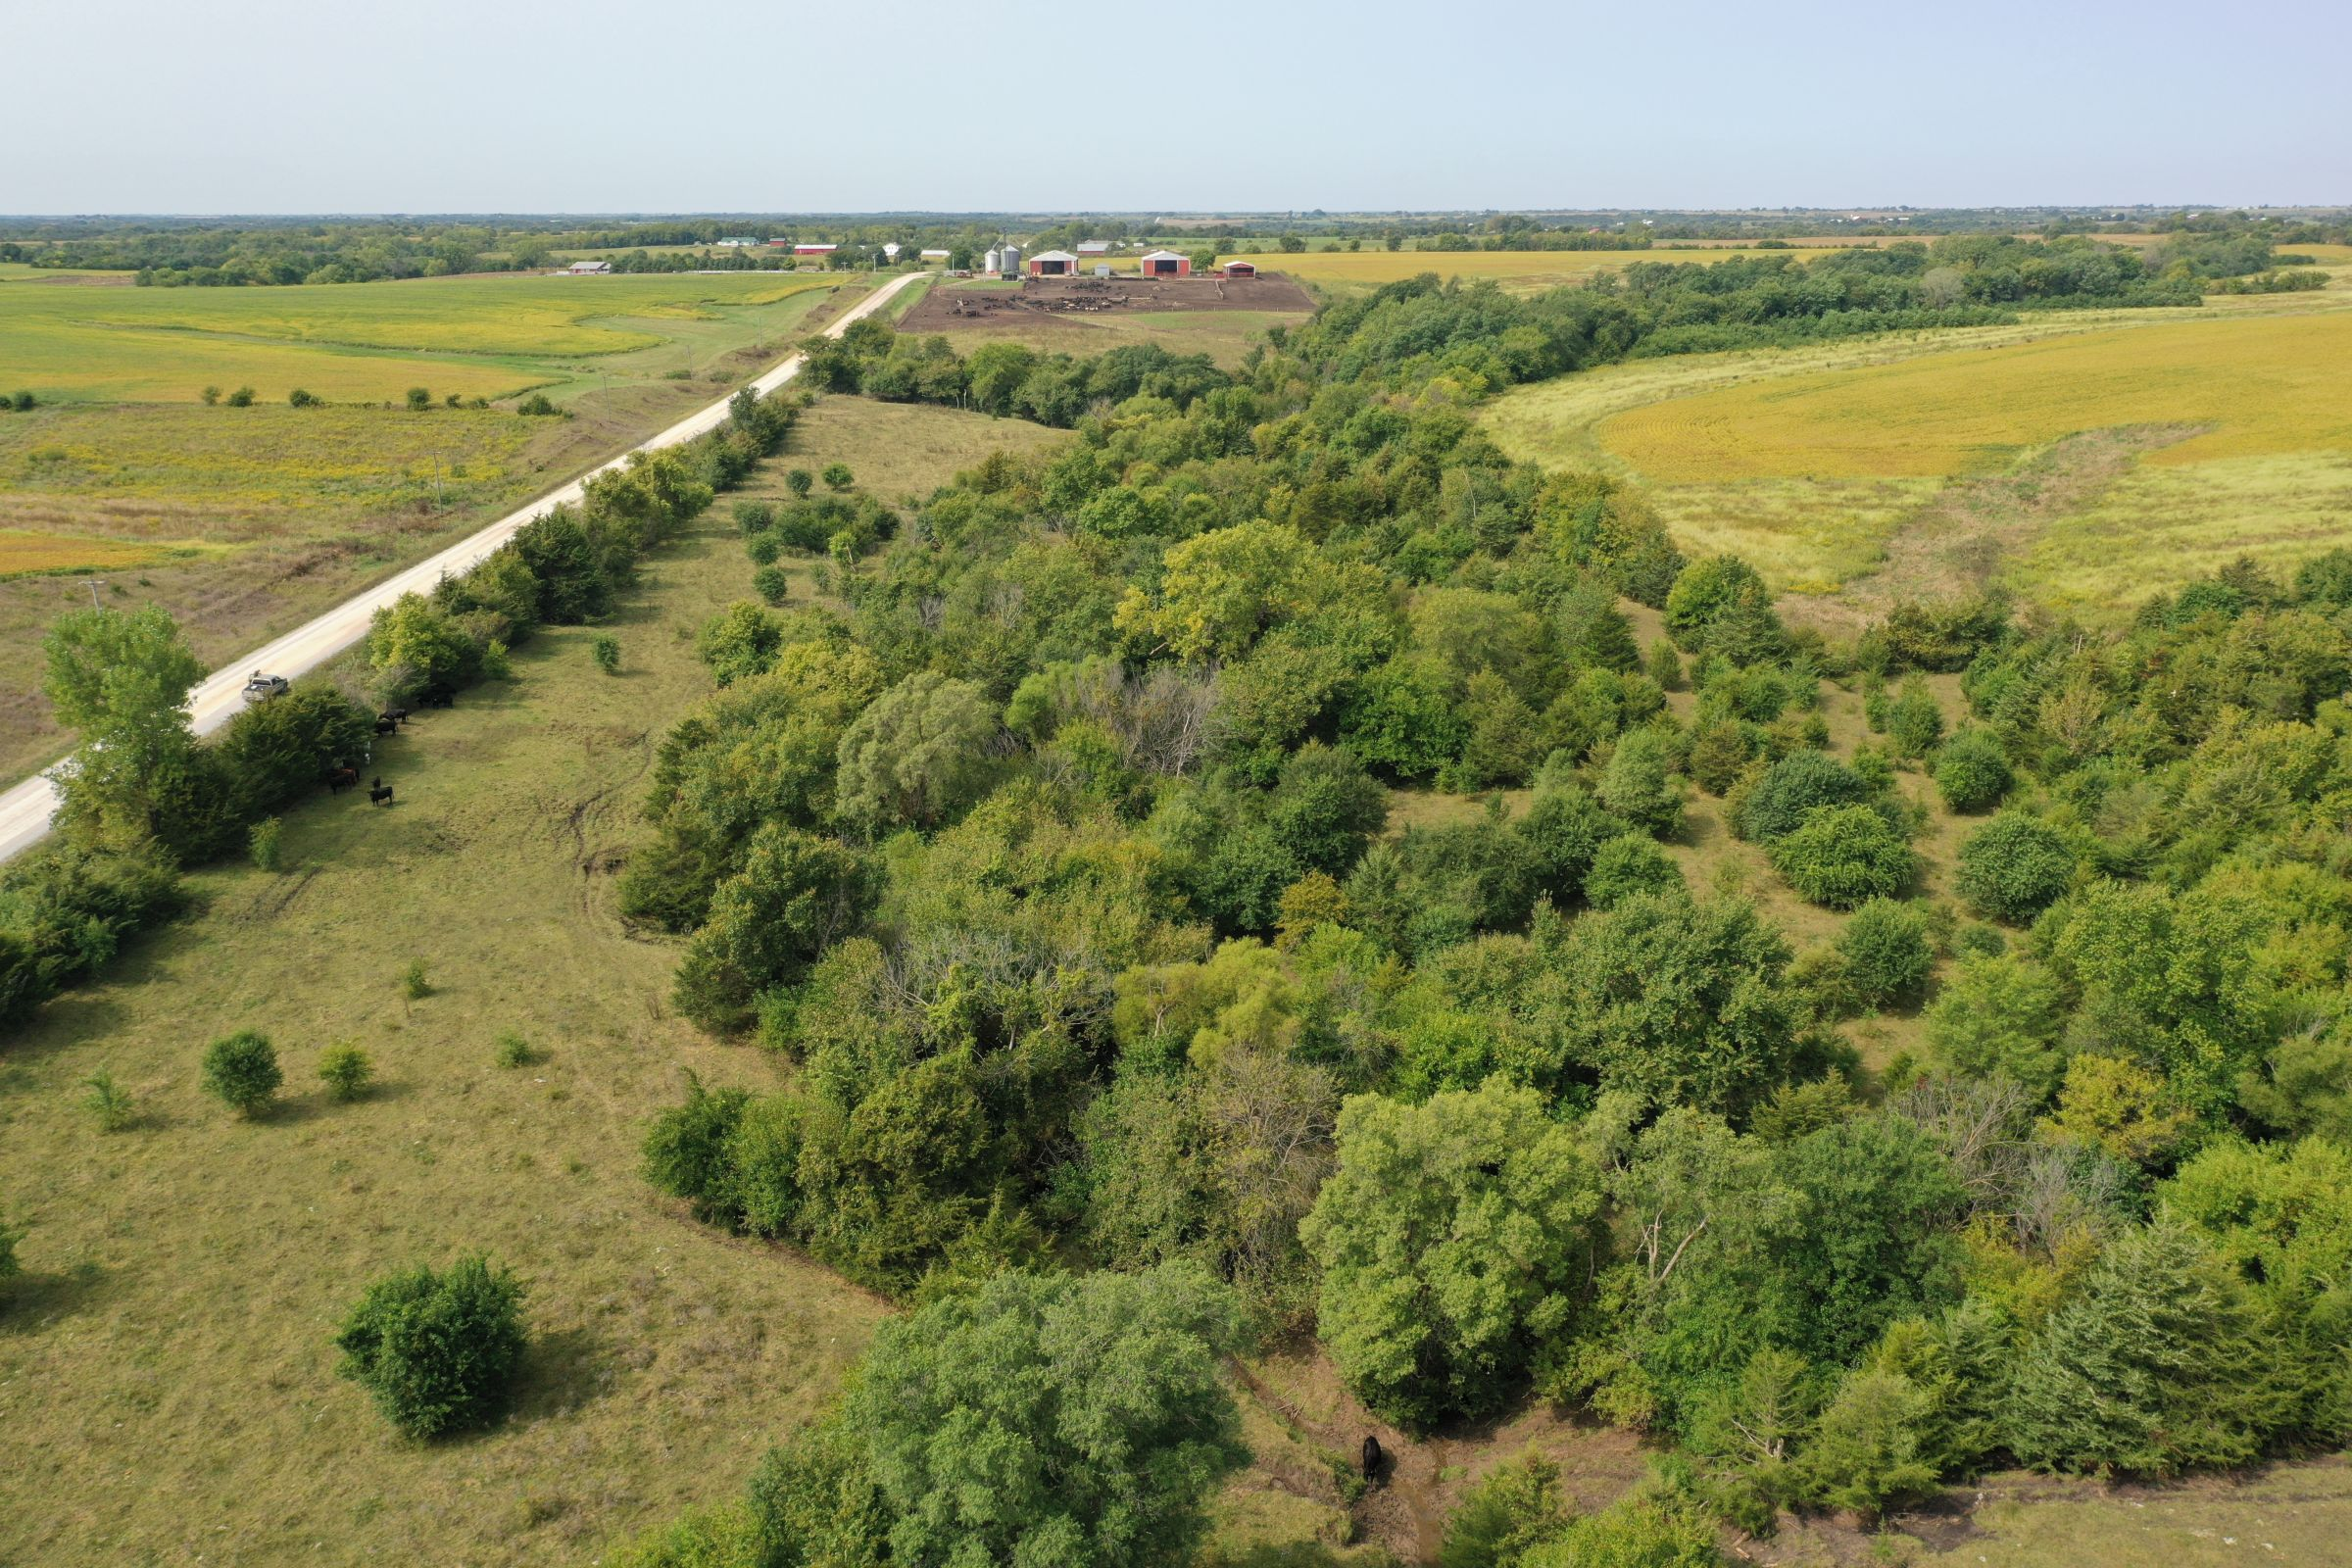 clarke-county-iowa-37-acres-listing-number-15398-0-2021-03-08-151149.jpg